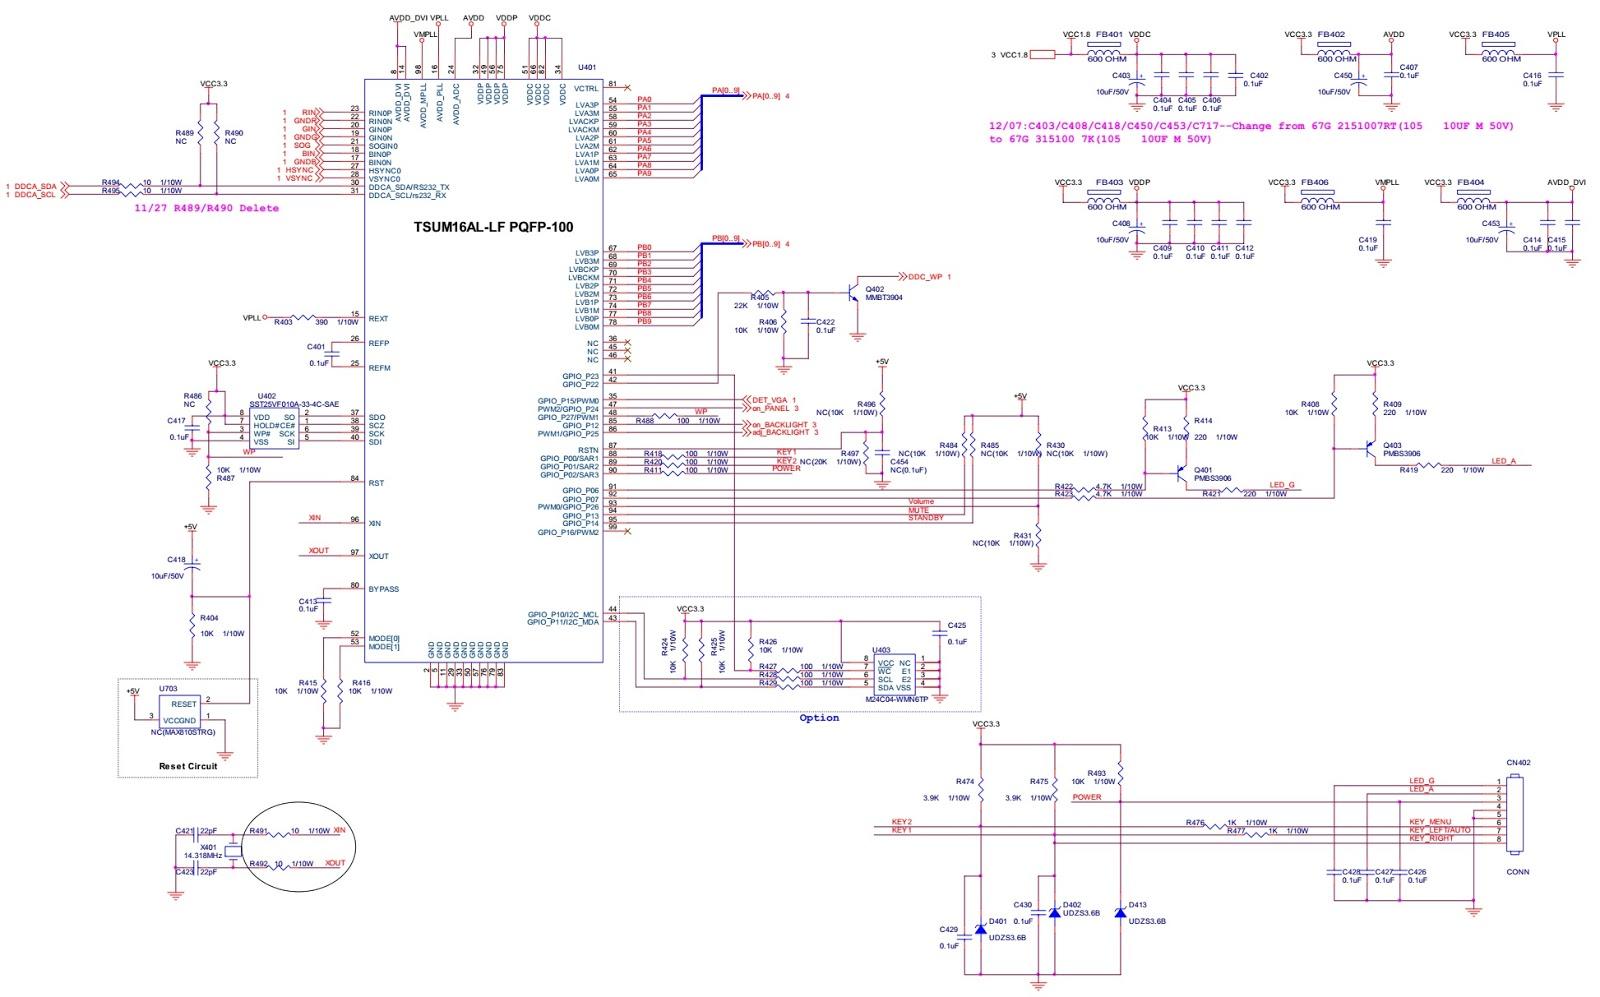 hp l1706 aoc l1706 17 inch tft lcd monitor schematic. Black Bedroom Furniture Sets. Home Design Ideas